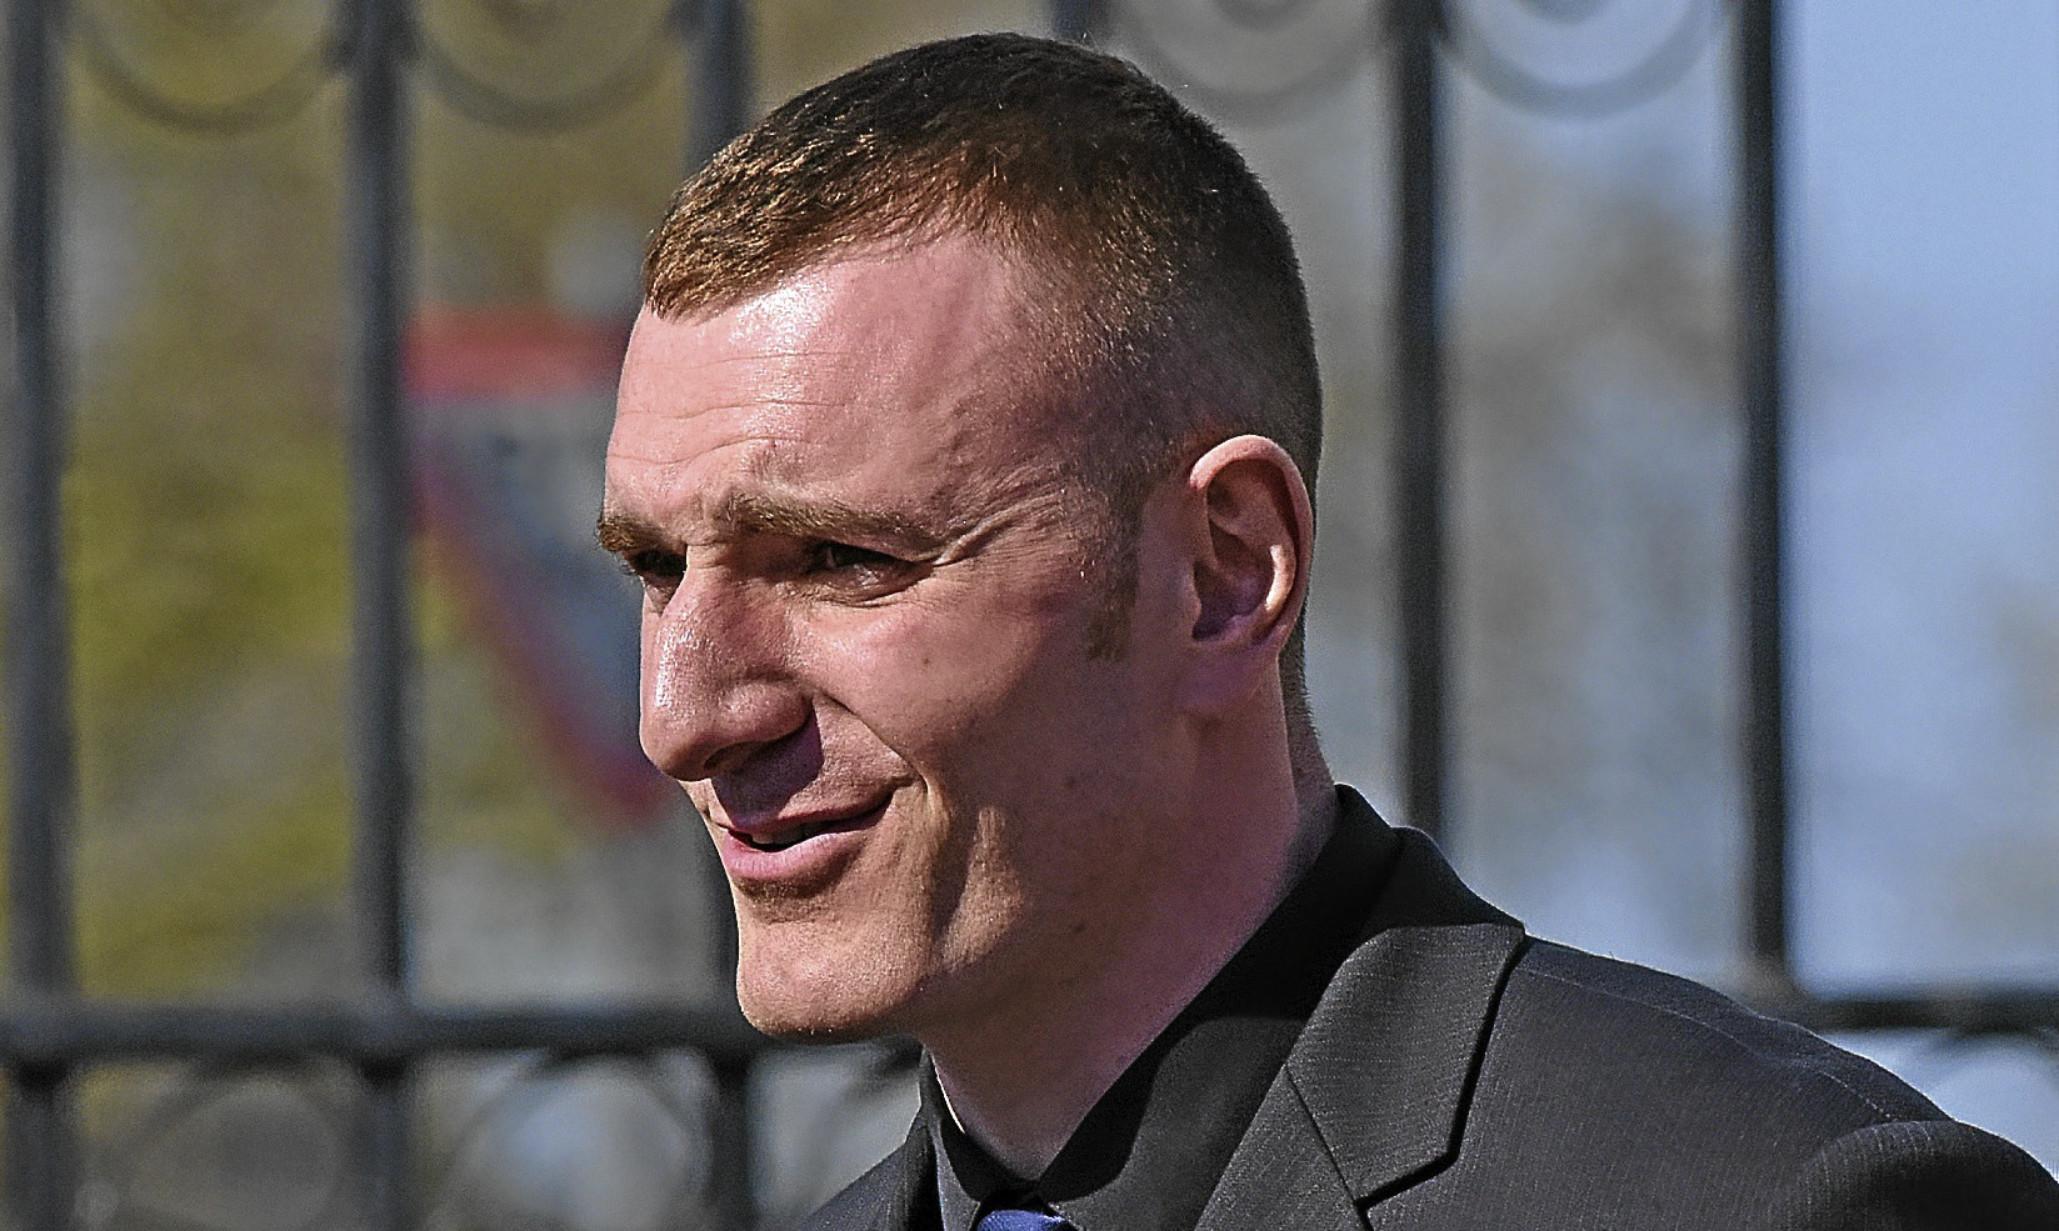 RM Condor marine recruit Carlo Nicholson